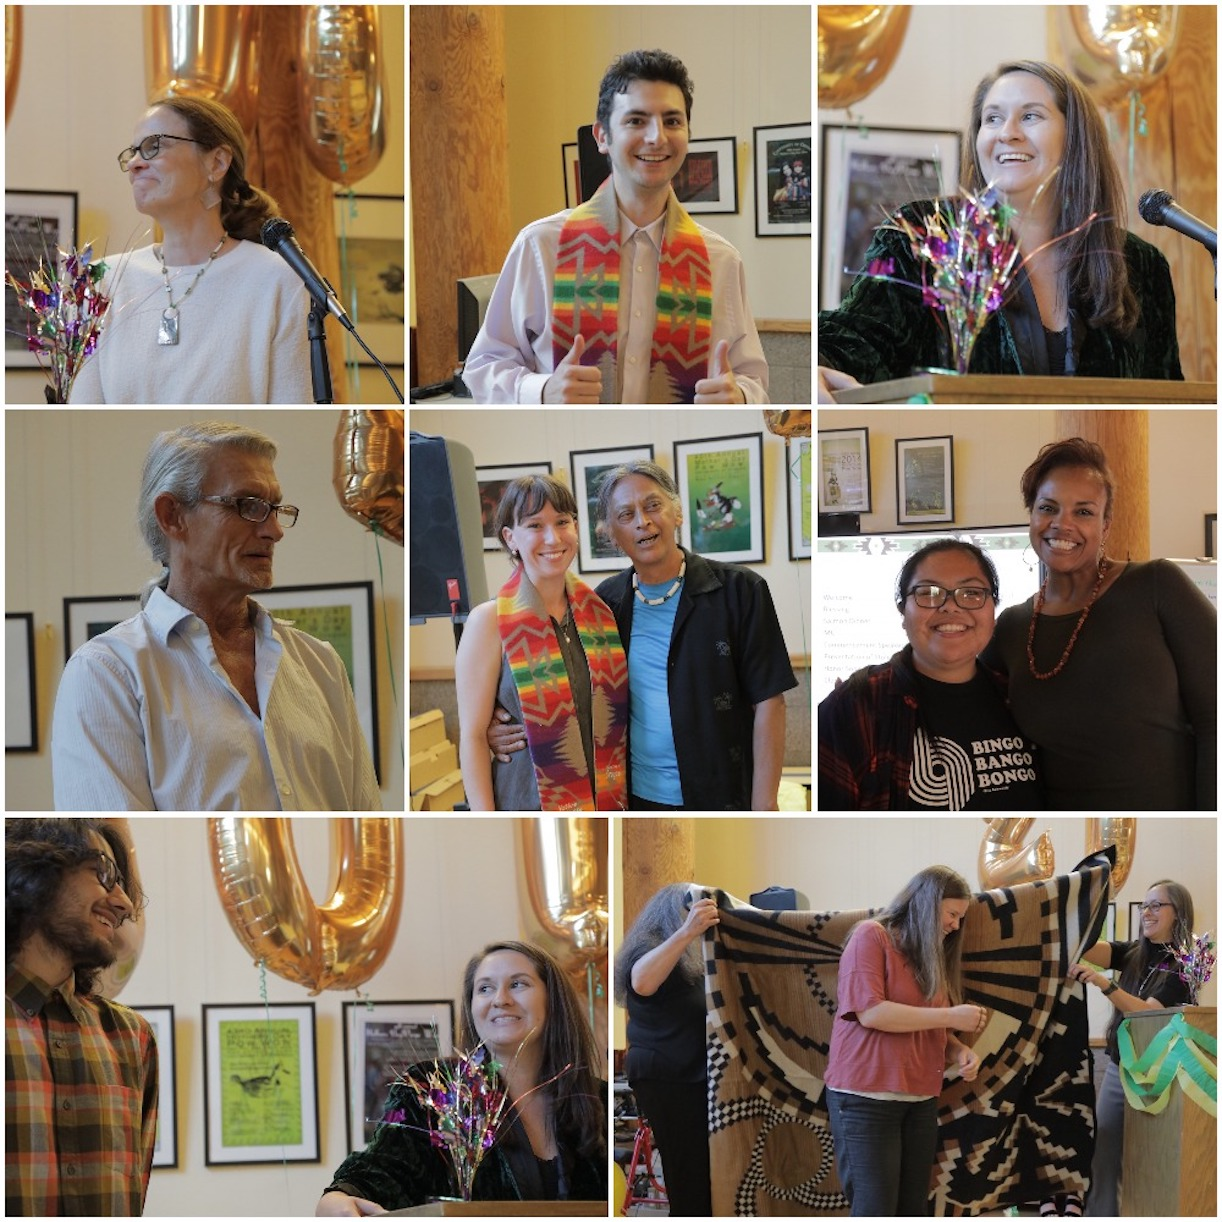 Native American Graduation Ceremony Photo Collage 6_18